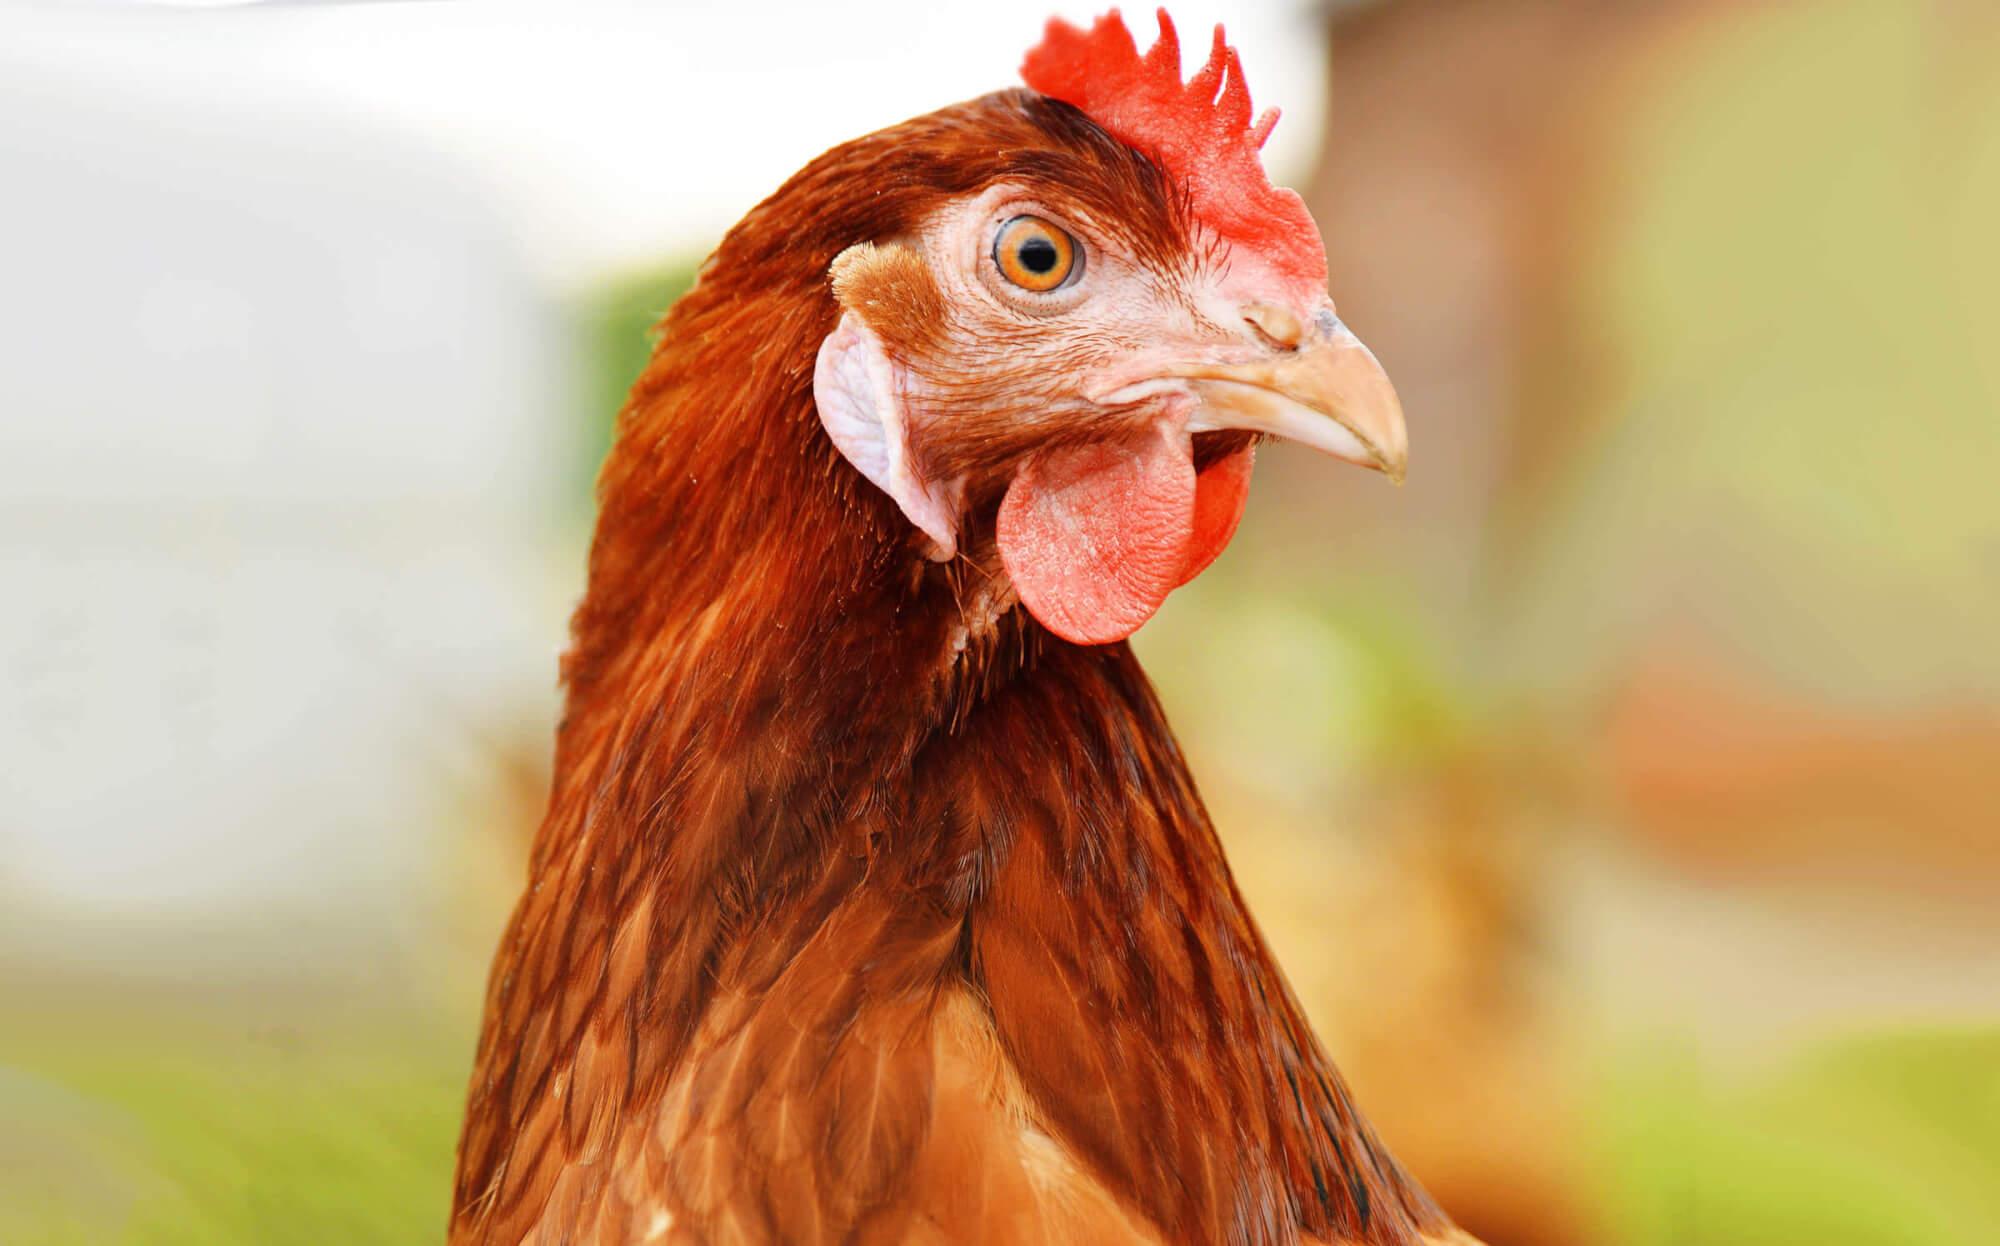 Популярная яичная порода кур Браун ник